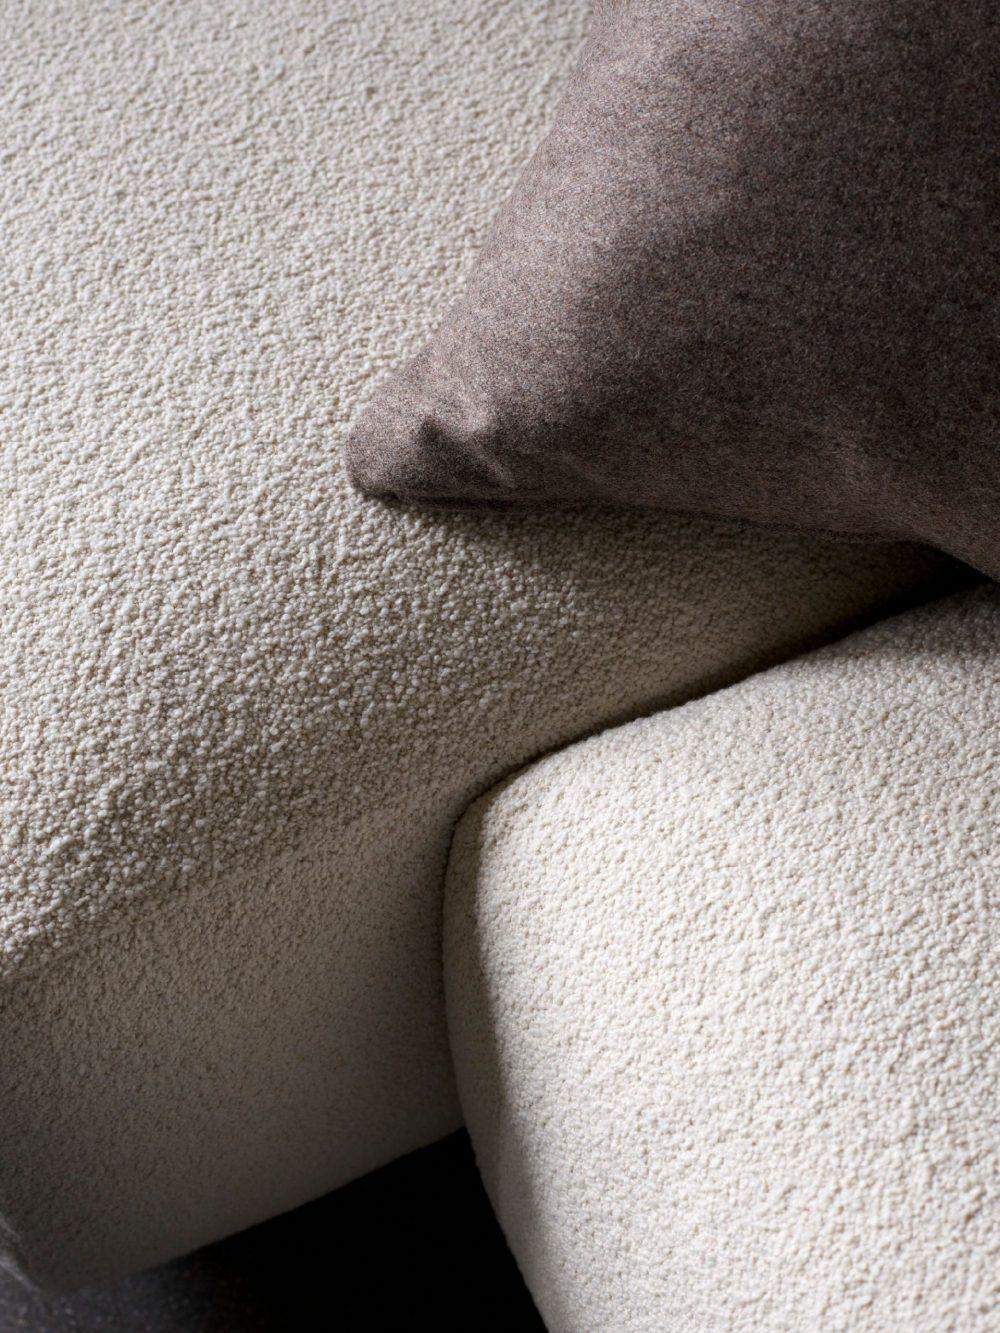 wendelbo sofa, wendelbo,copenhangen,丹麥沙發,丹麥家具,sofa, 進口沙發,北歐風,北歐家具,北歐設計,nordic, nordic design,訂製沙發,布沙發,真皮沙發,極簡設計